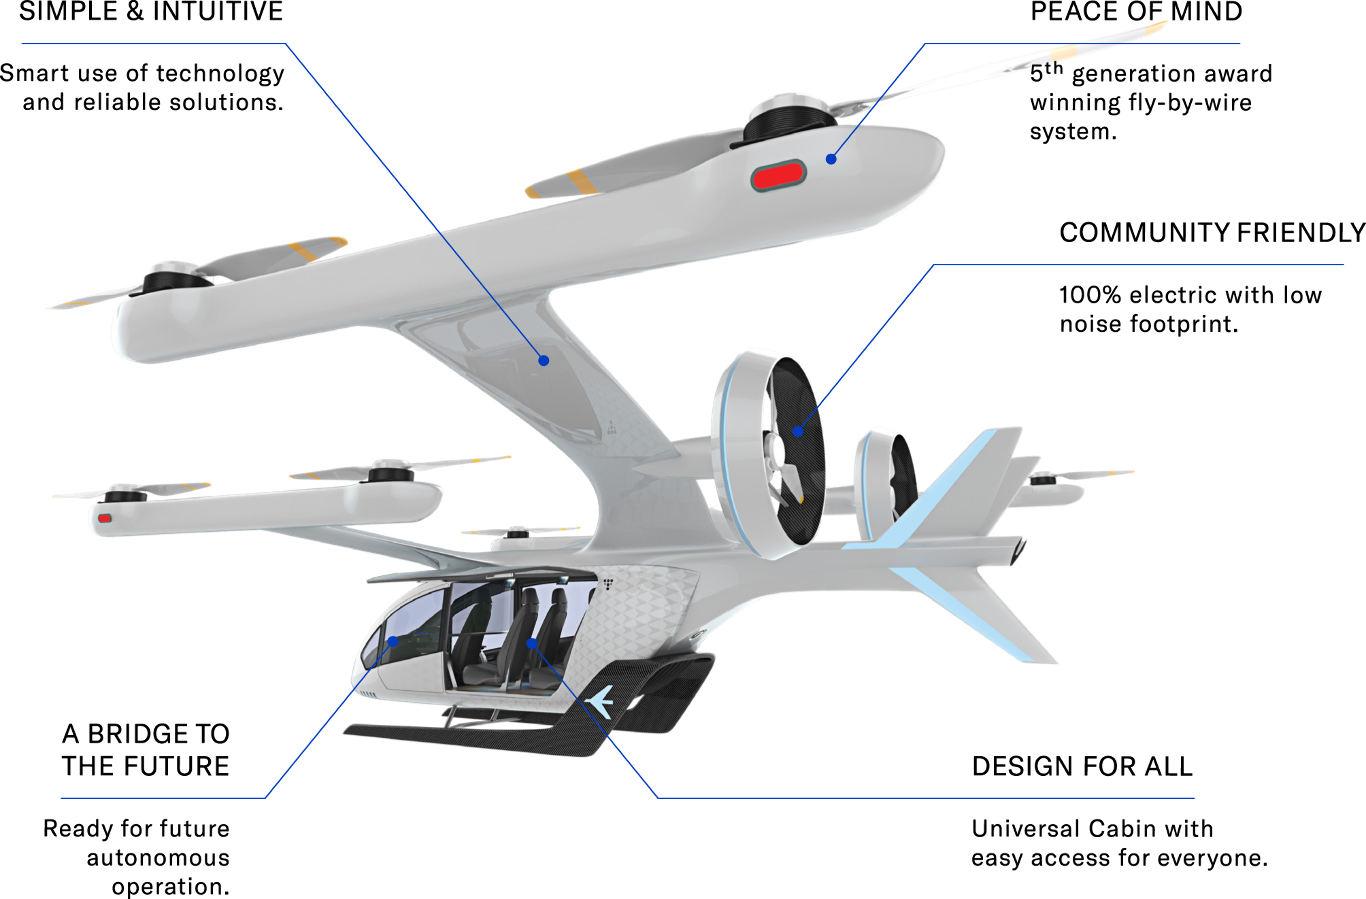 EmbraerX dévoile son concept de taxi aérien urbain